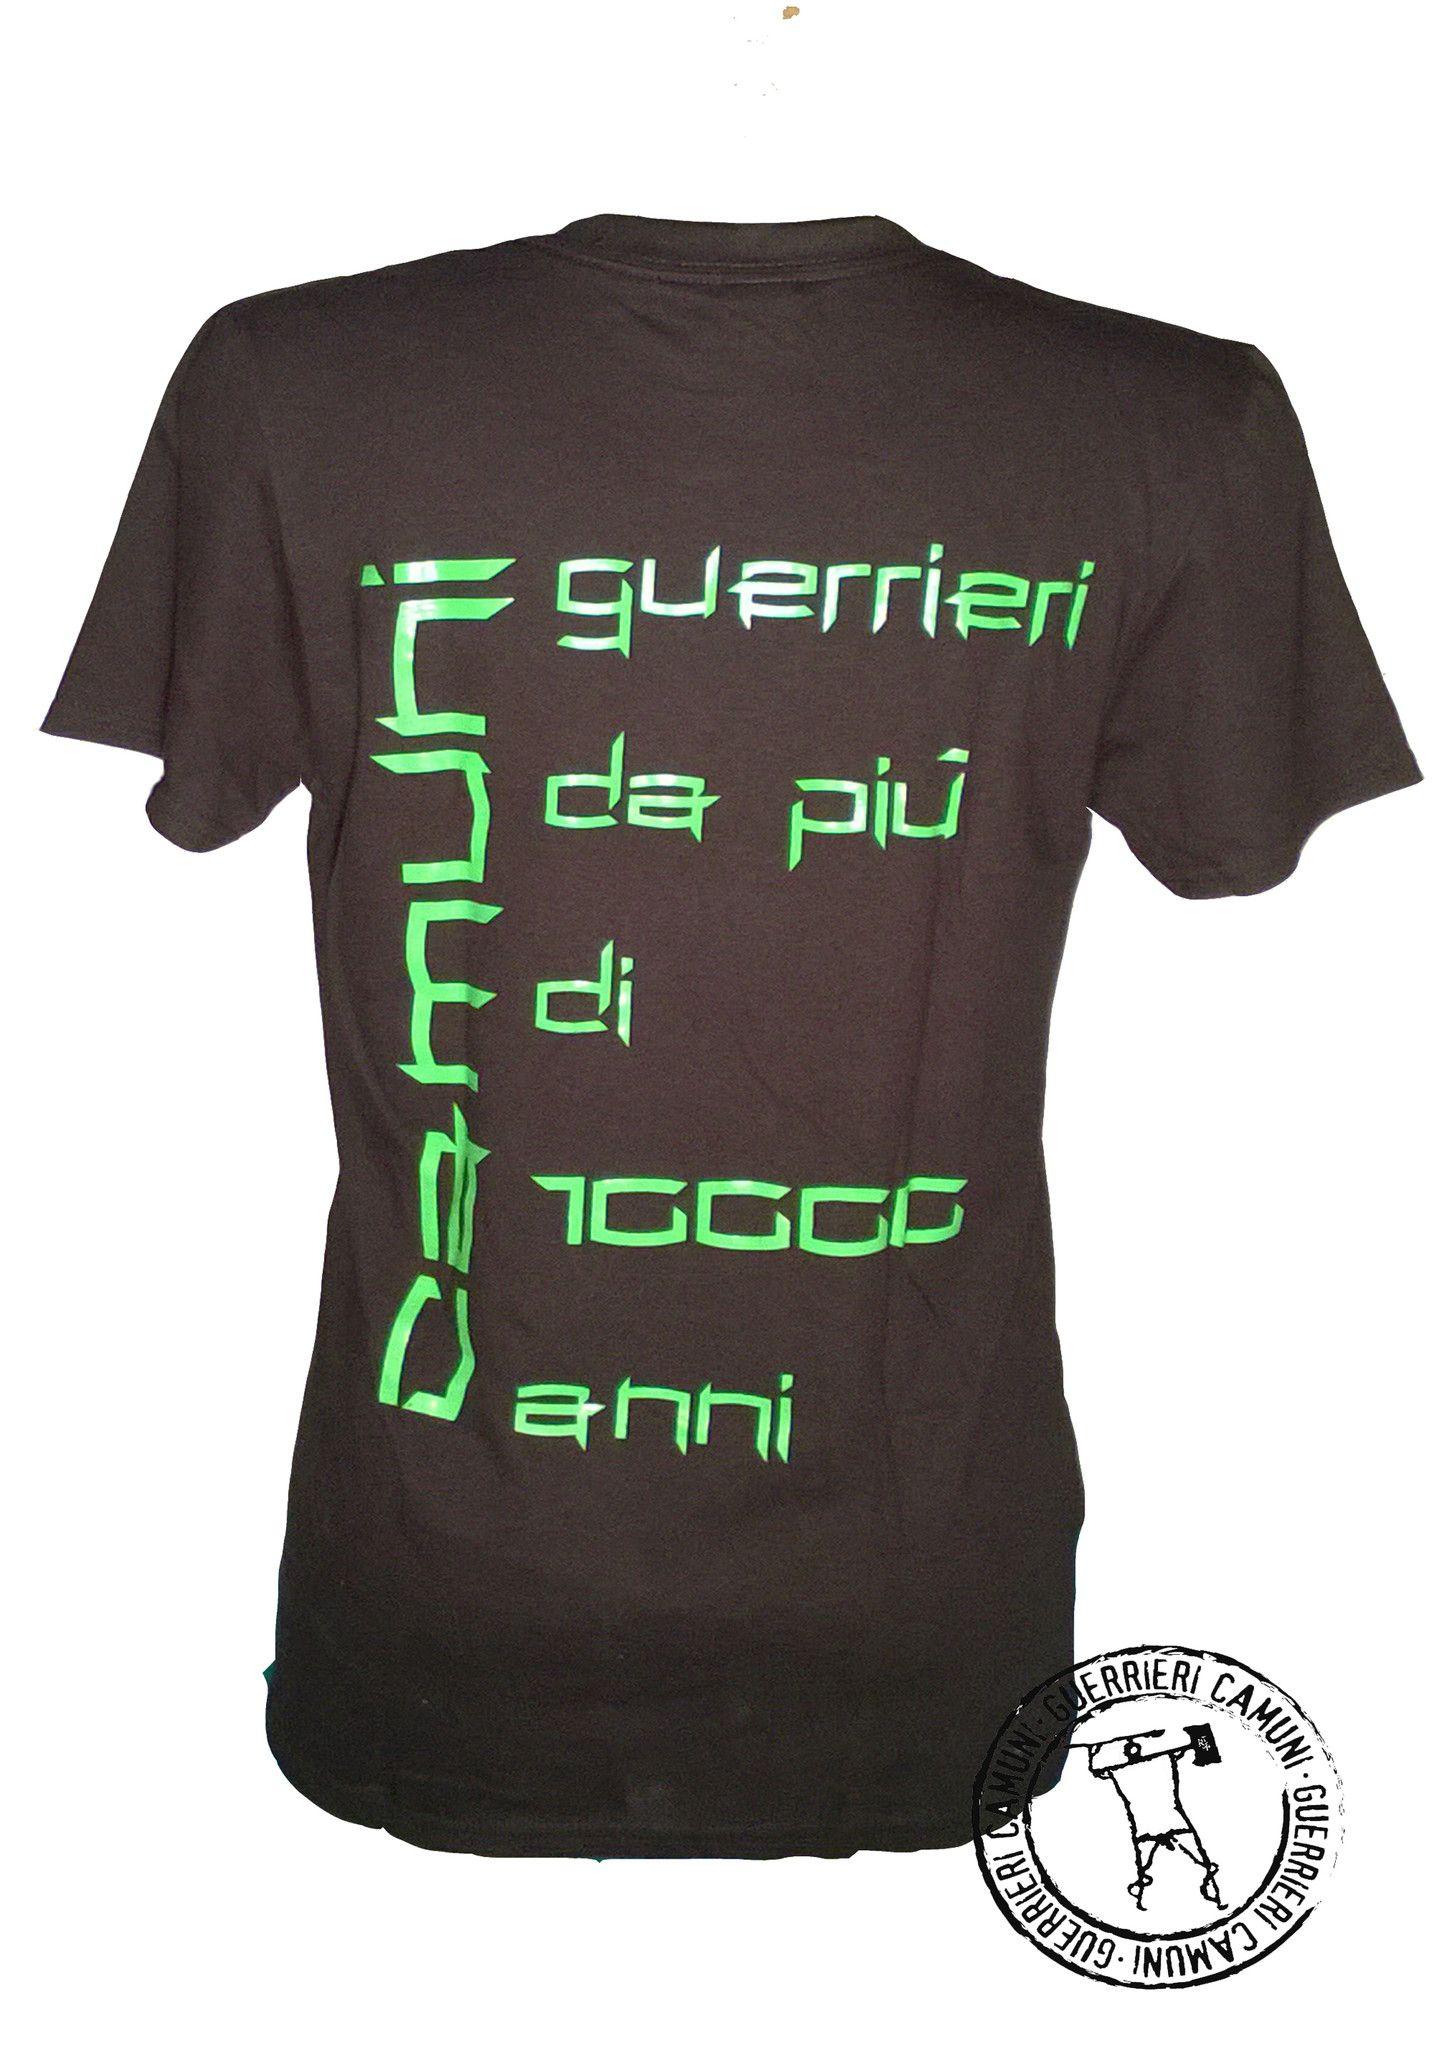 Maglietta T-Shirt Incisioni Rupestri Guerriero Camuno Verde Unisex Nera